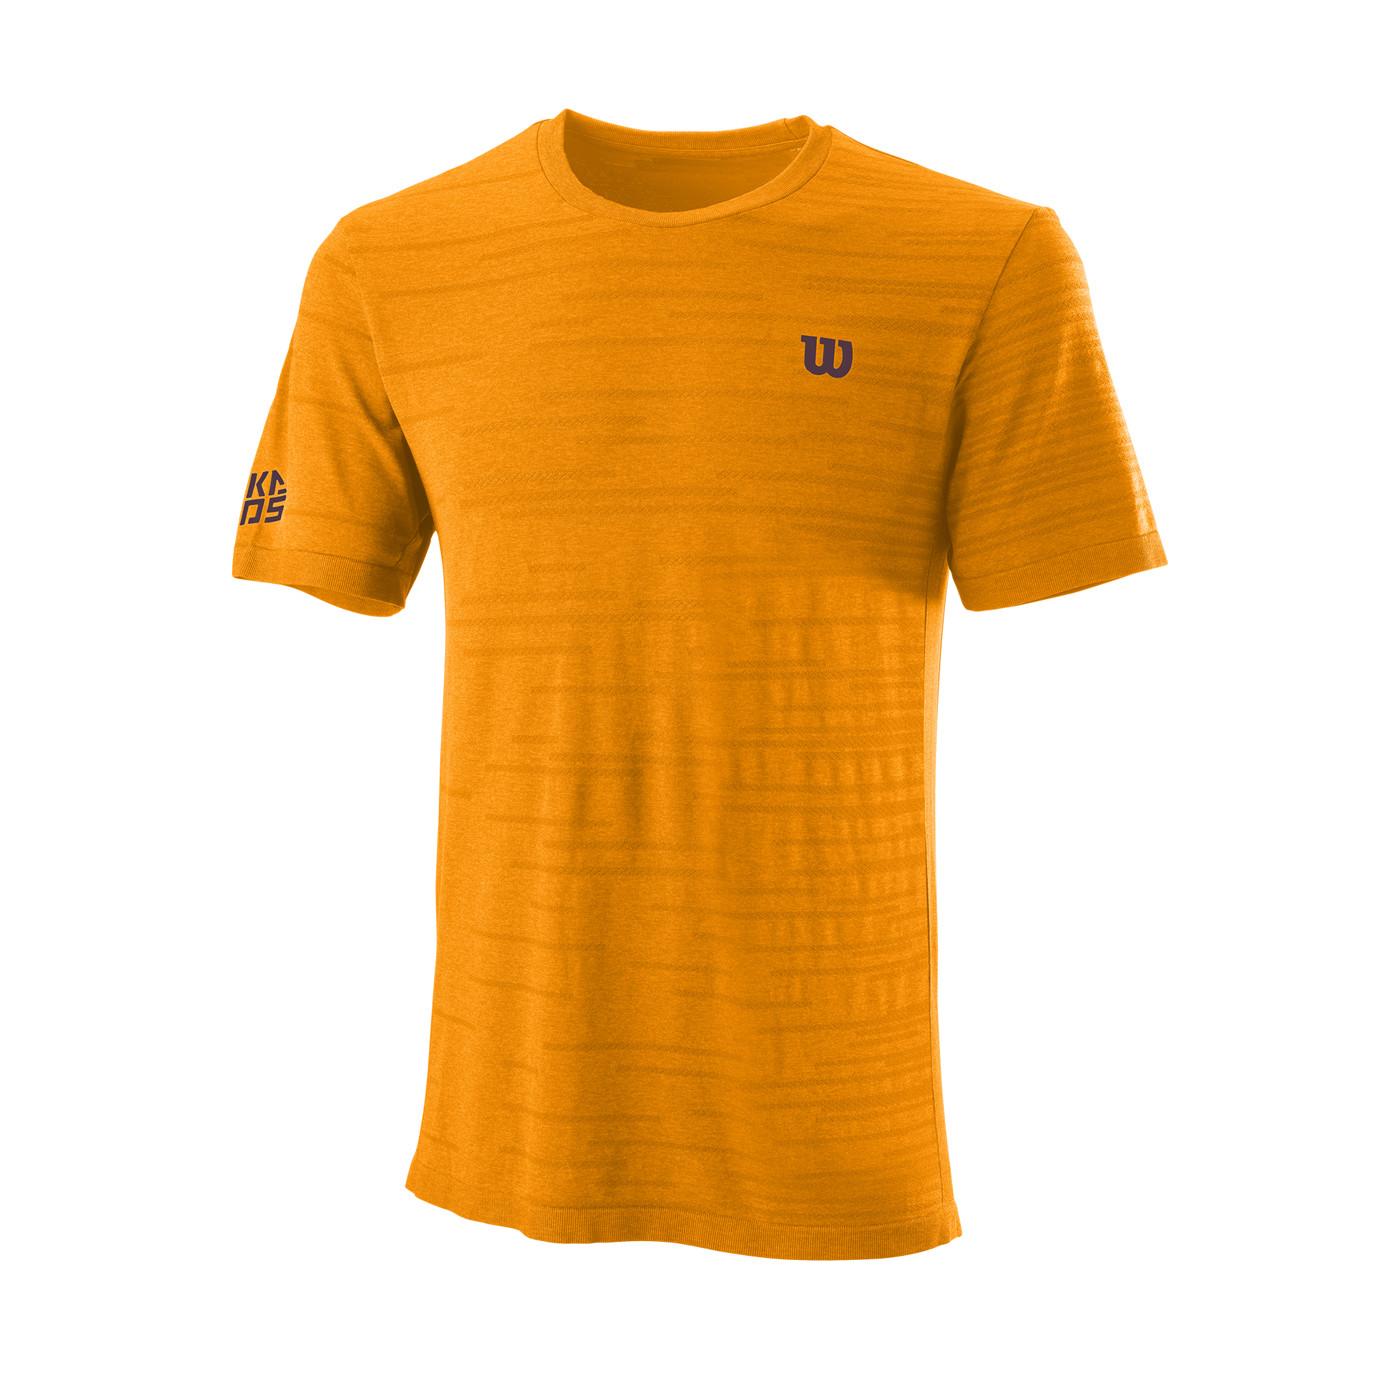 WILSON M KAOS RAPIDE SMLS CREW Koi Orange XL - Herren